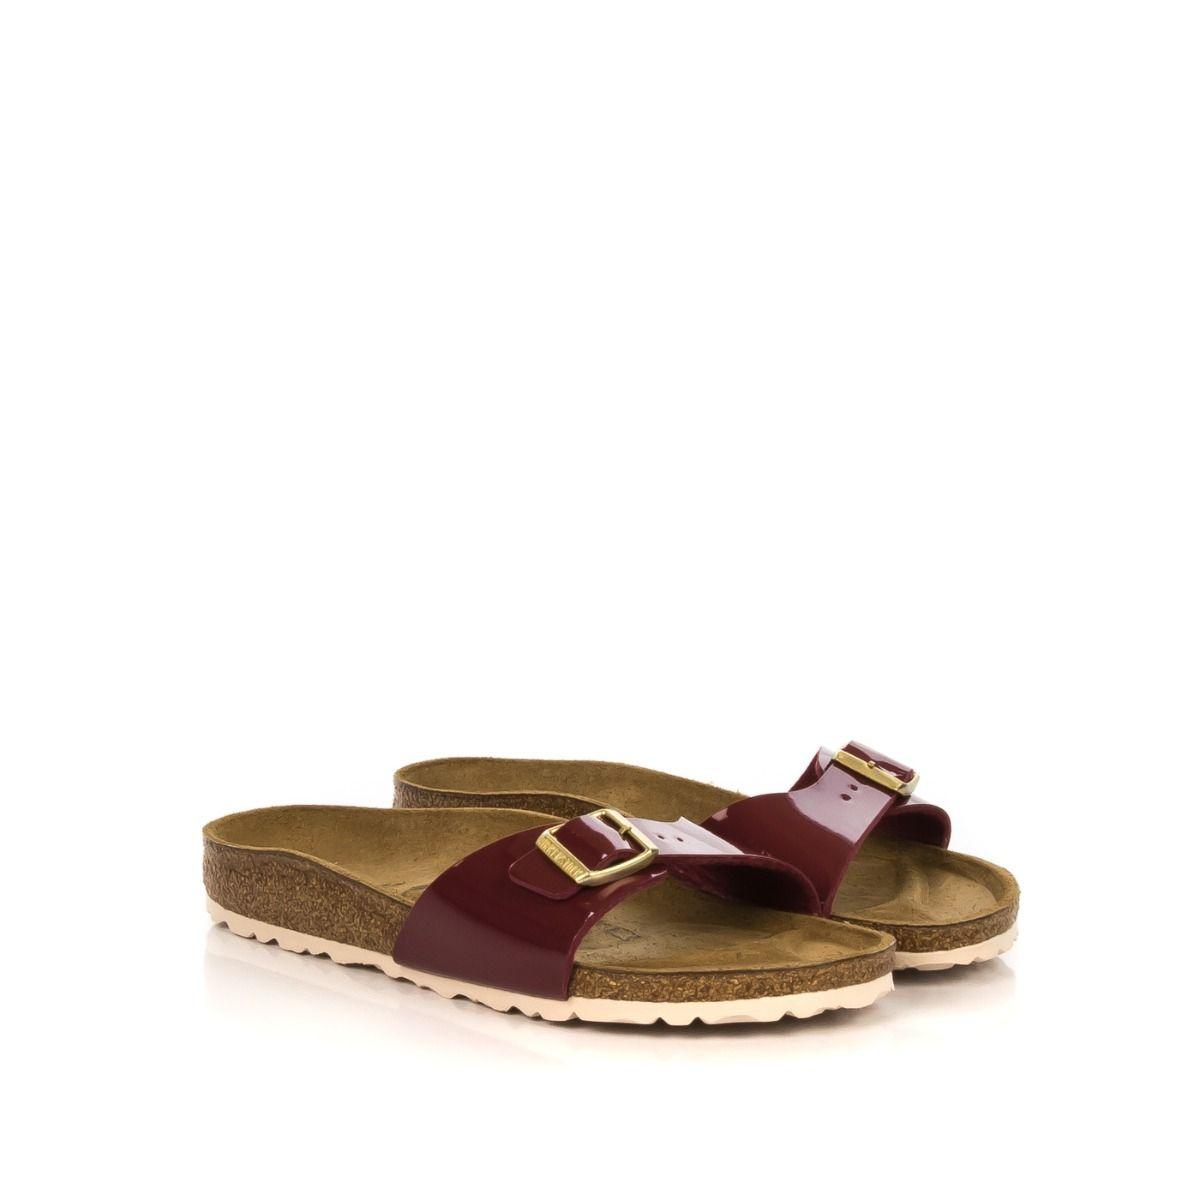 2bf7ec63f9cb9b Ciabatta donna|BIRKENSTOCK 1013082 MADRID vernice bordeaux una fascia|Shop  online|Shoe Center